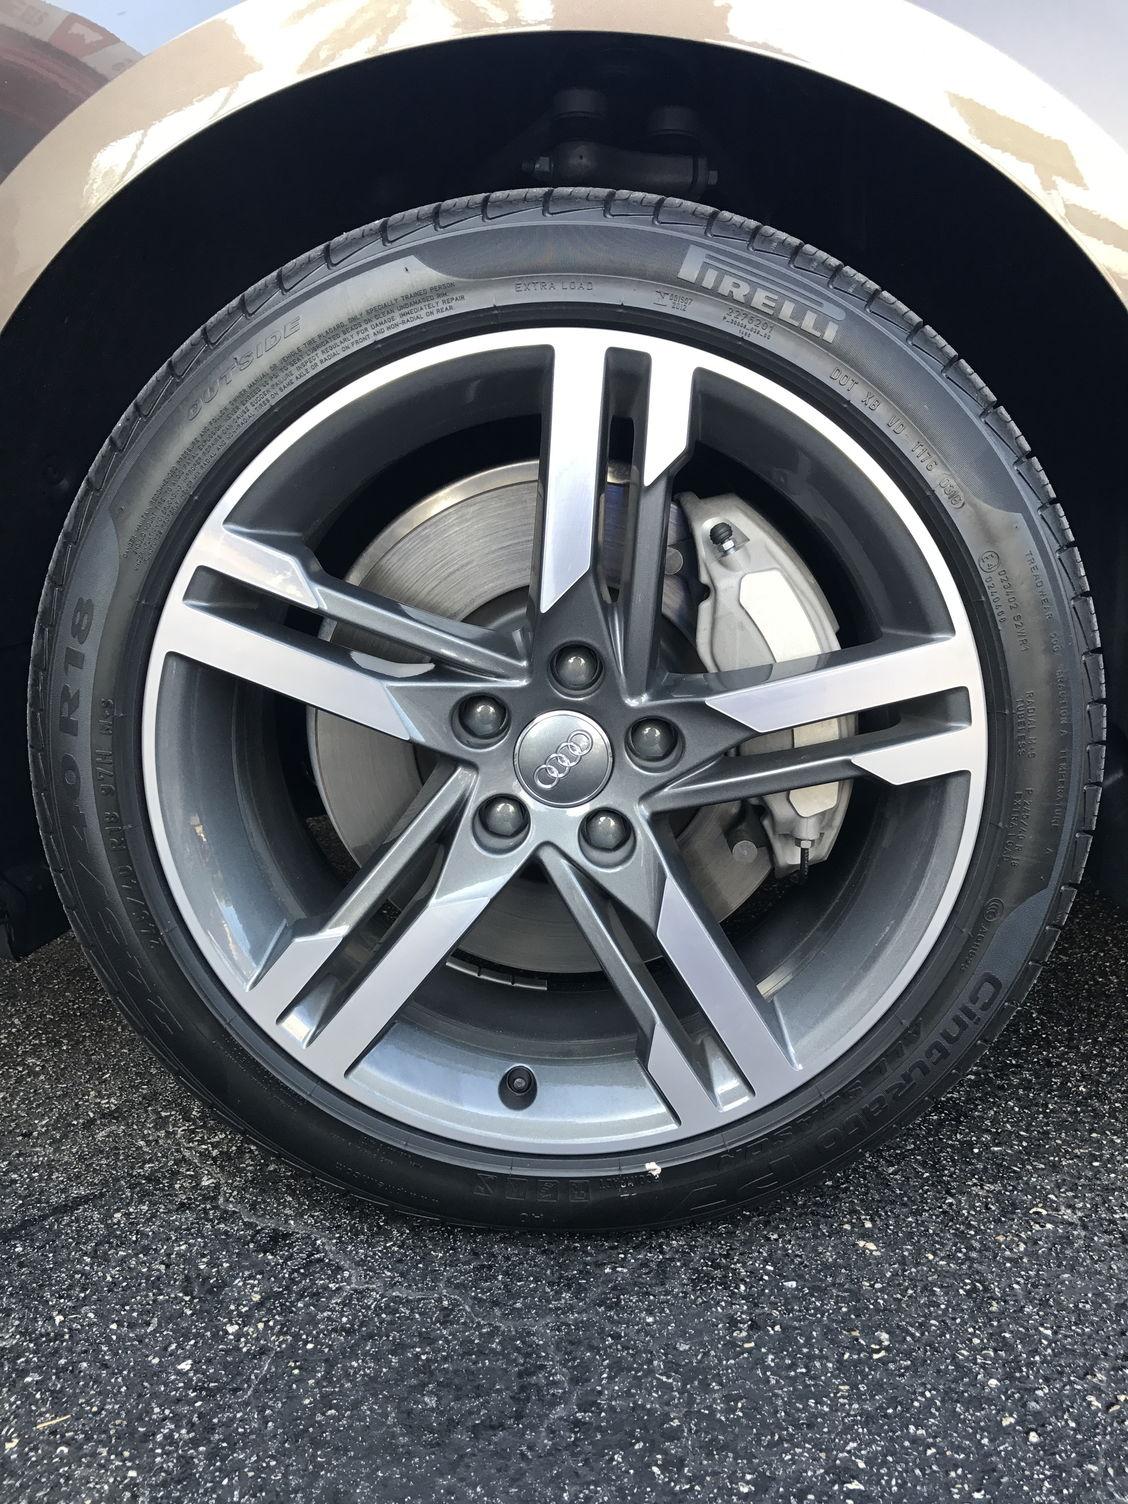 Audi A4 2017 Audi A4 B9 18 Inch Oem Wheels And Tires